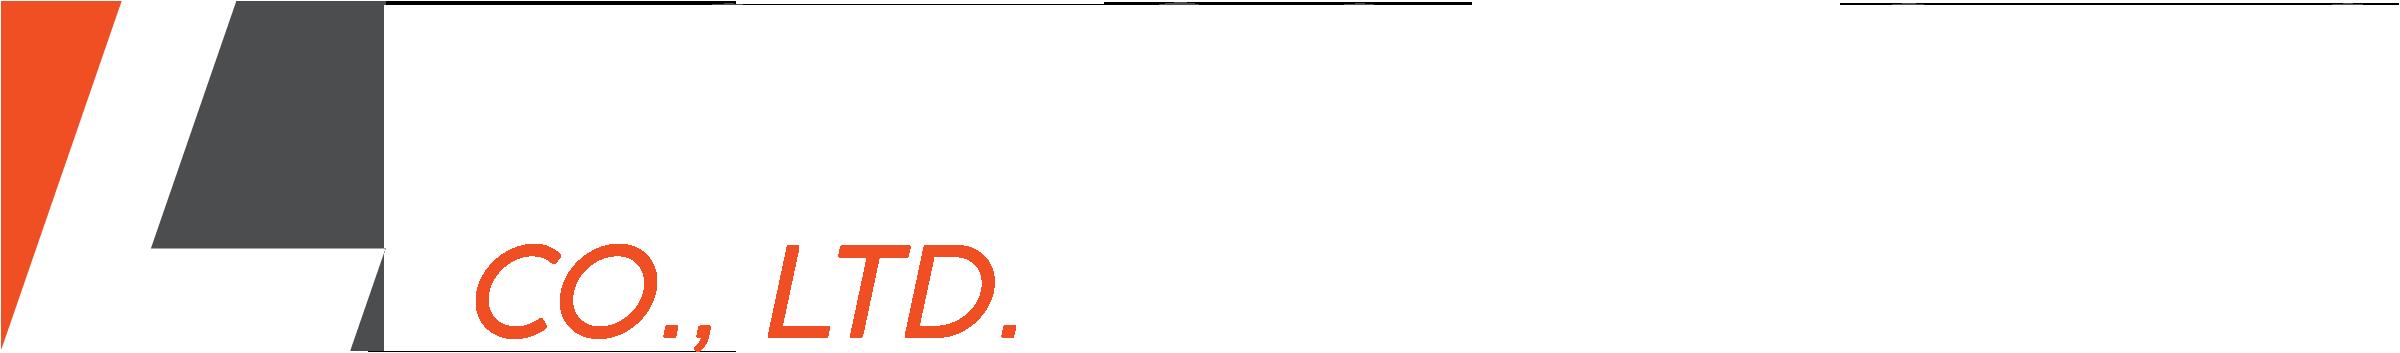 lgm logo white